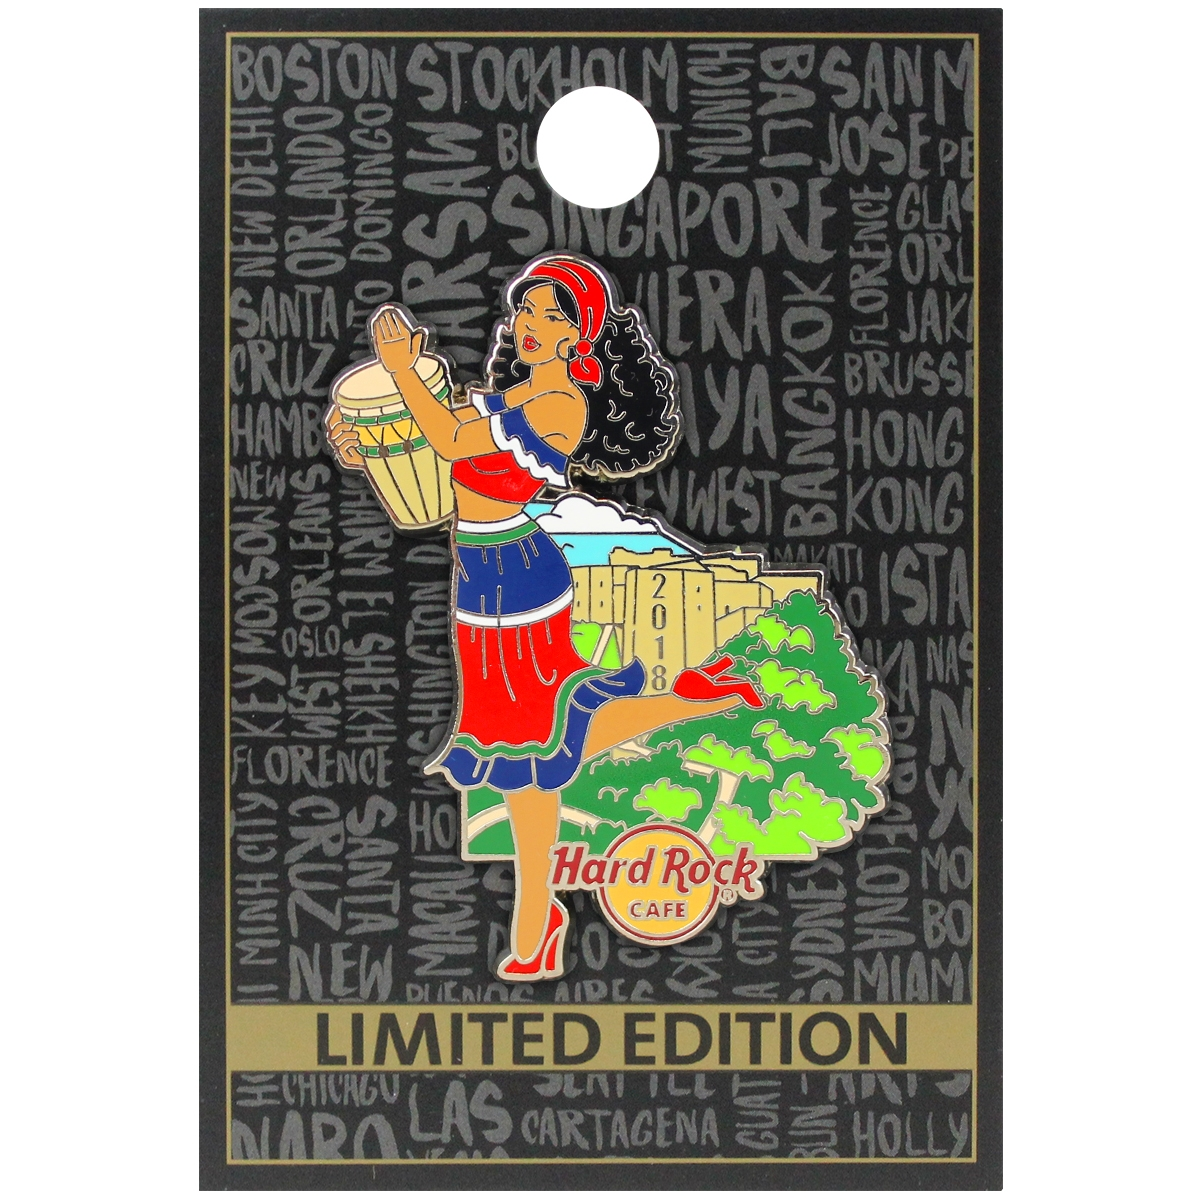 Pin Up Girl Series Haiti 18 0